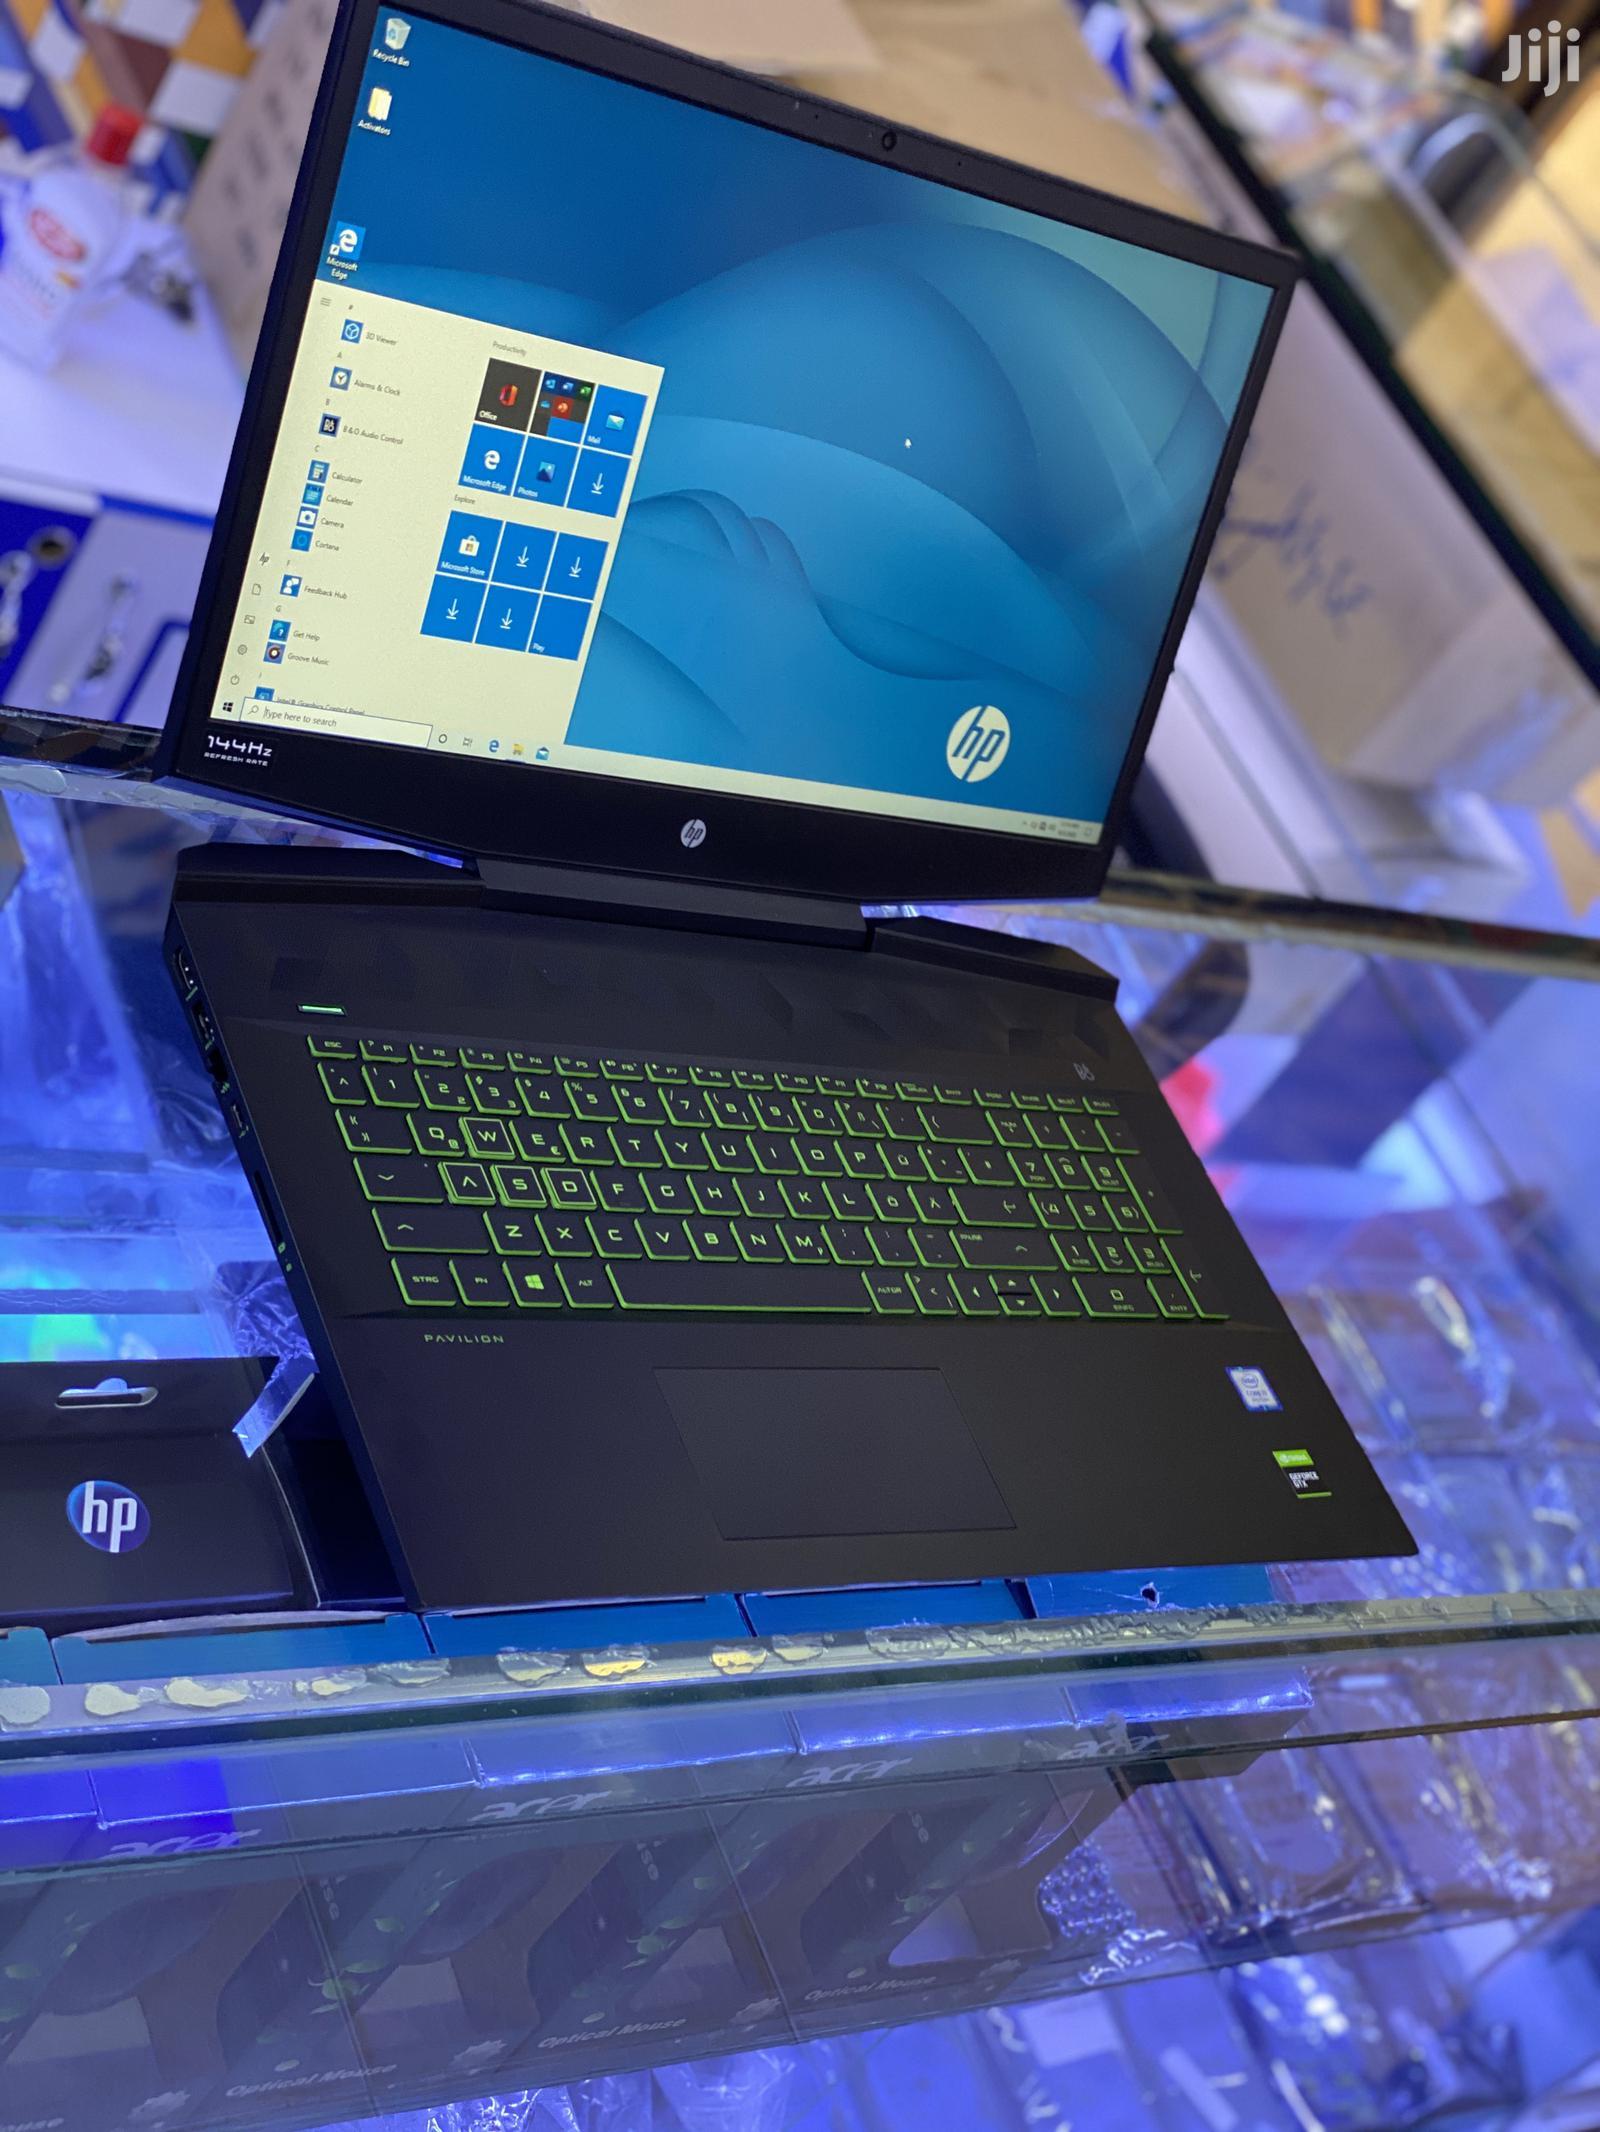 New Laptop HP Pavilion 17t 16GB Intel Core i7 SSHD (Hybrid) 512GB | Laptops & Computers for sale in Kampala, Central Region, Uganda